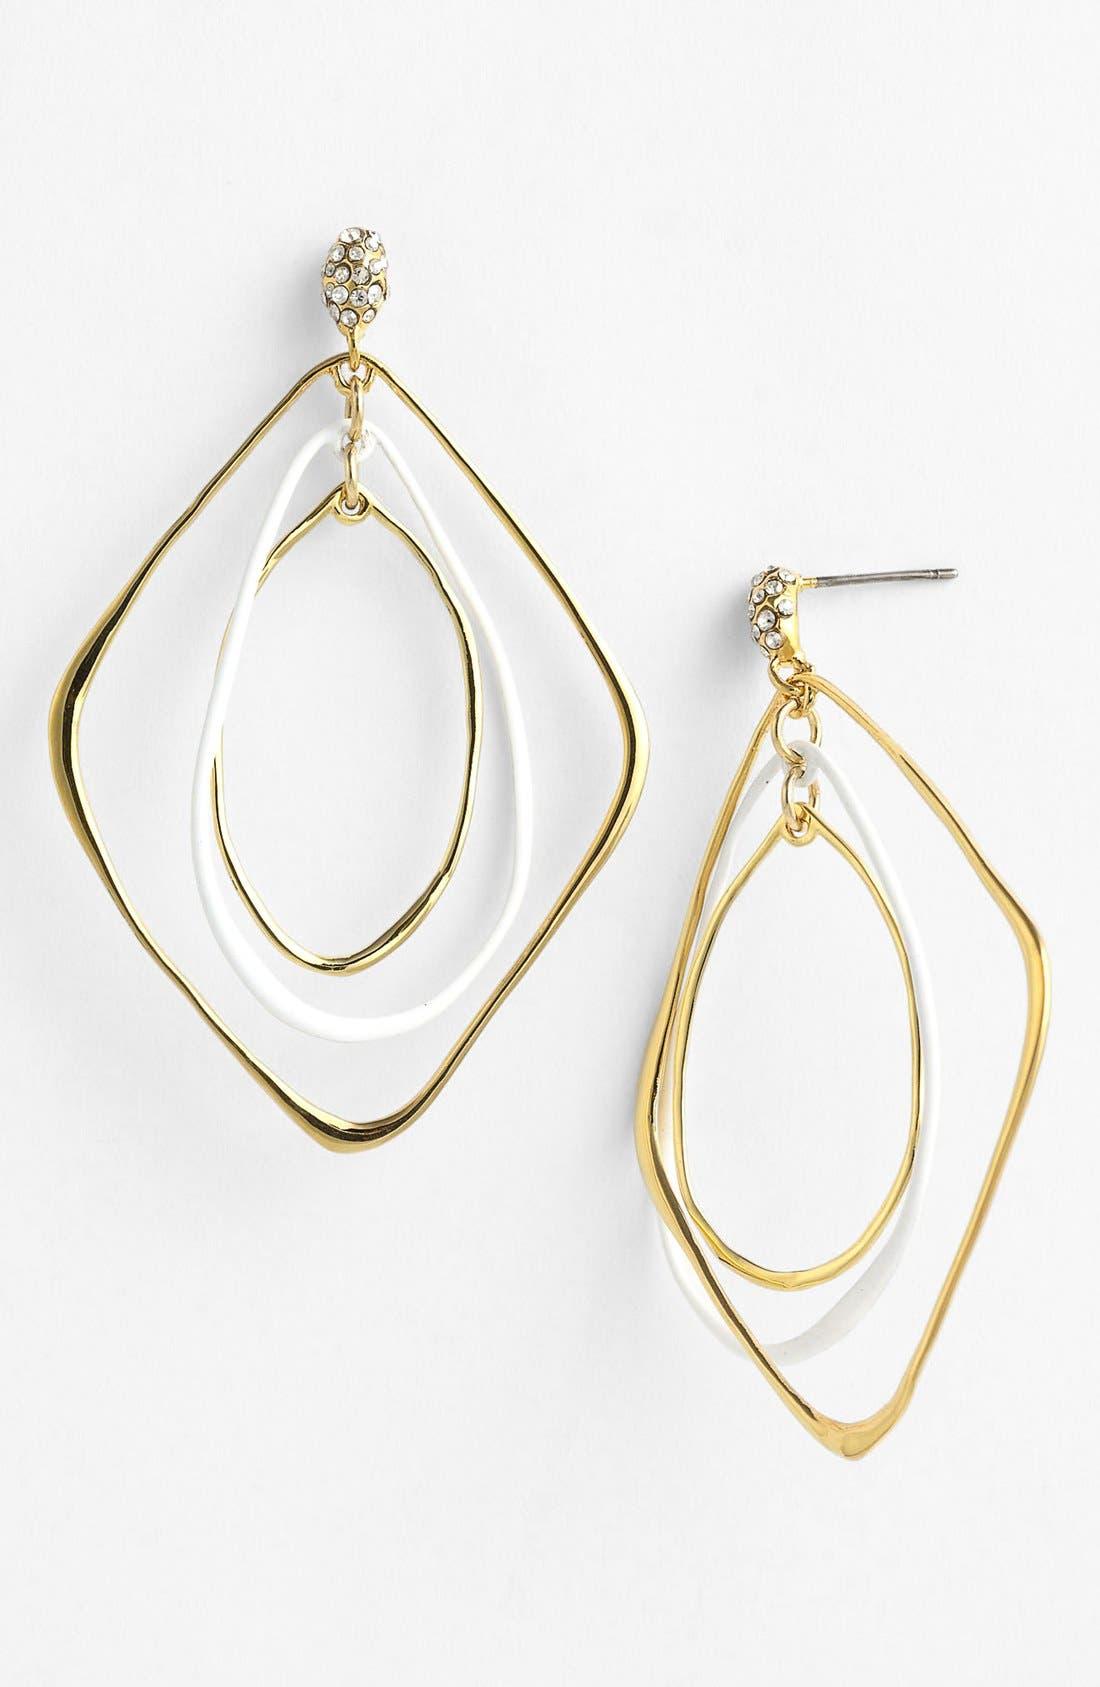 Main Image - Alexis Bittar 'Miss Havisham - Liquid Gold' Orbiting Drop Earrings